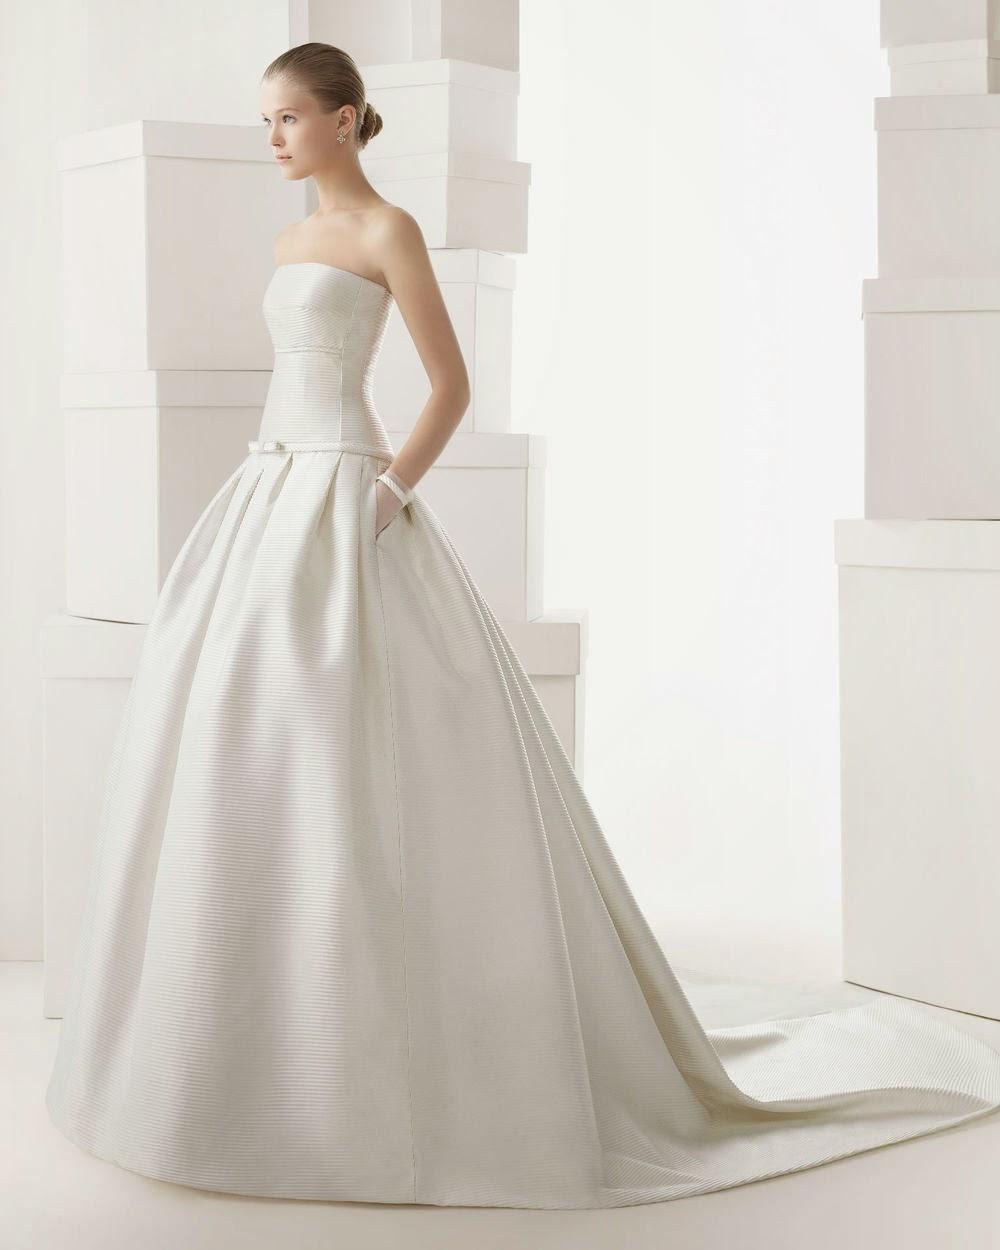 wedding dress; wedding dress ideas;  wedding gown; wedding gown ideas;  wedding dress ball; wedding gown ball; wedding gown ideas